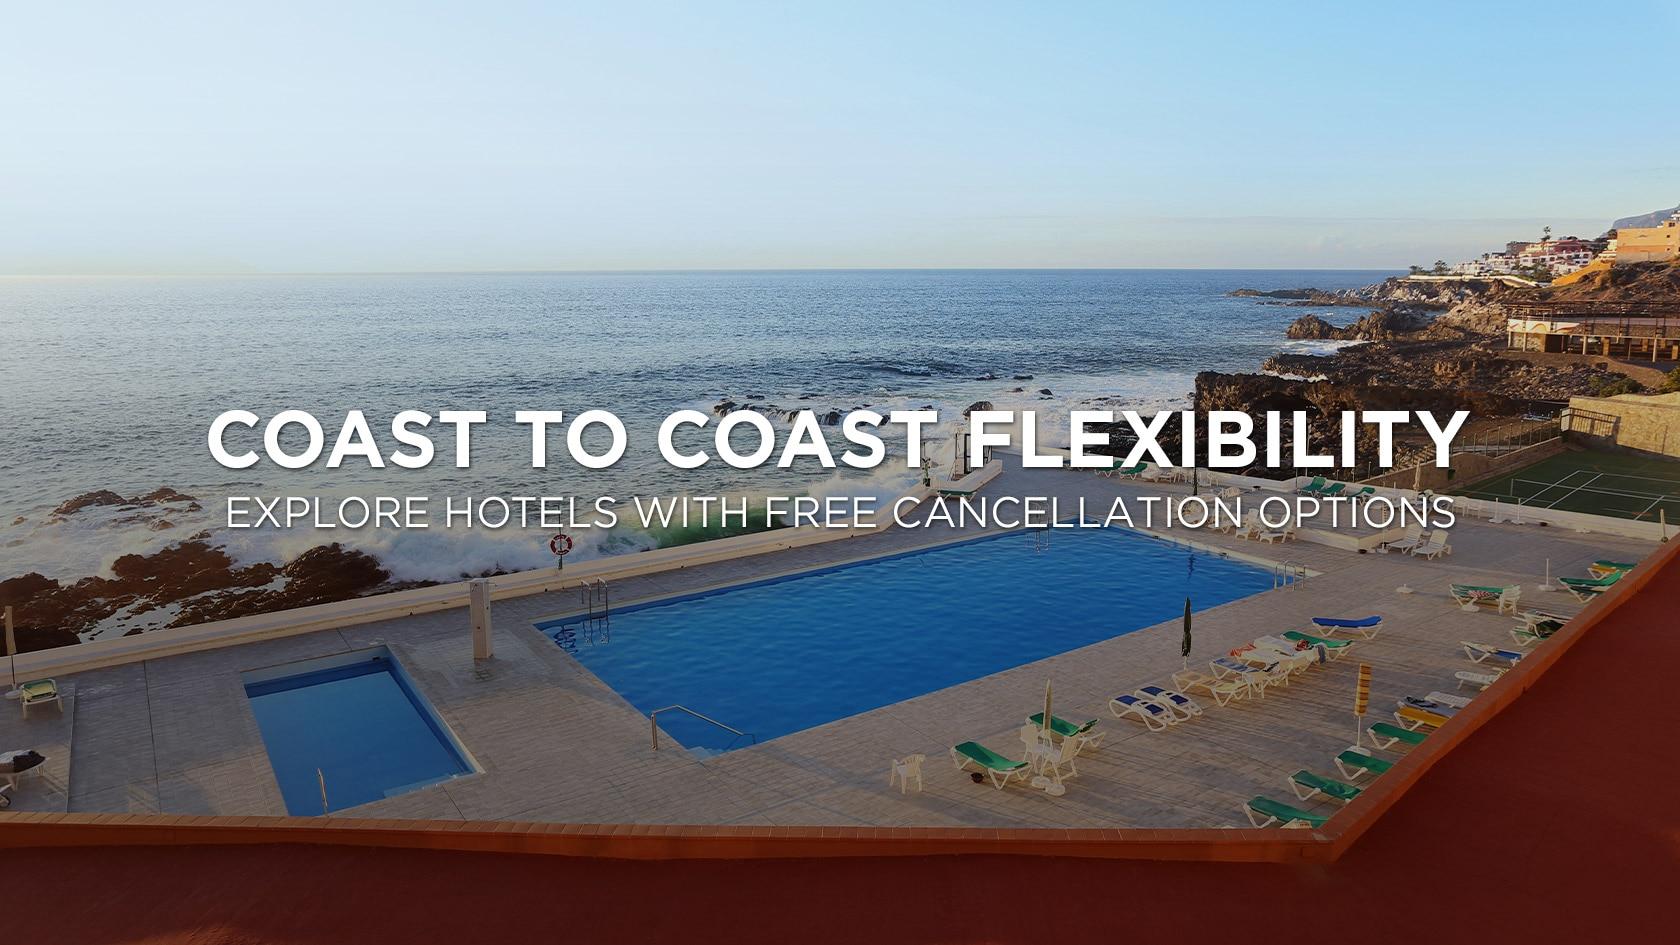 Travelocity.com: Coast to Coast Flexibility Explore Hotels